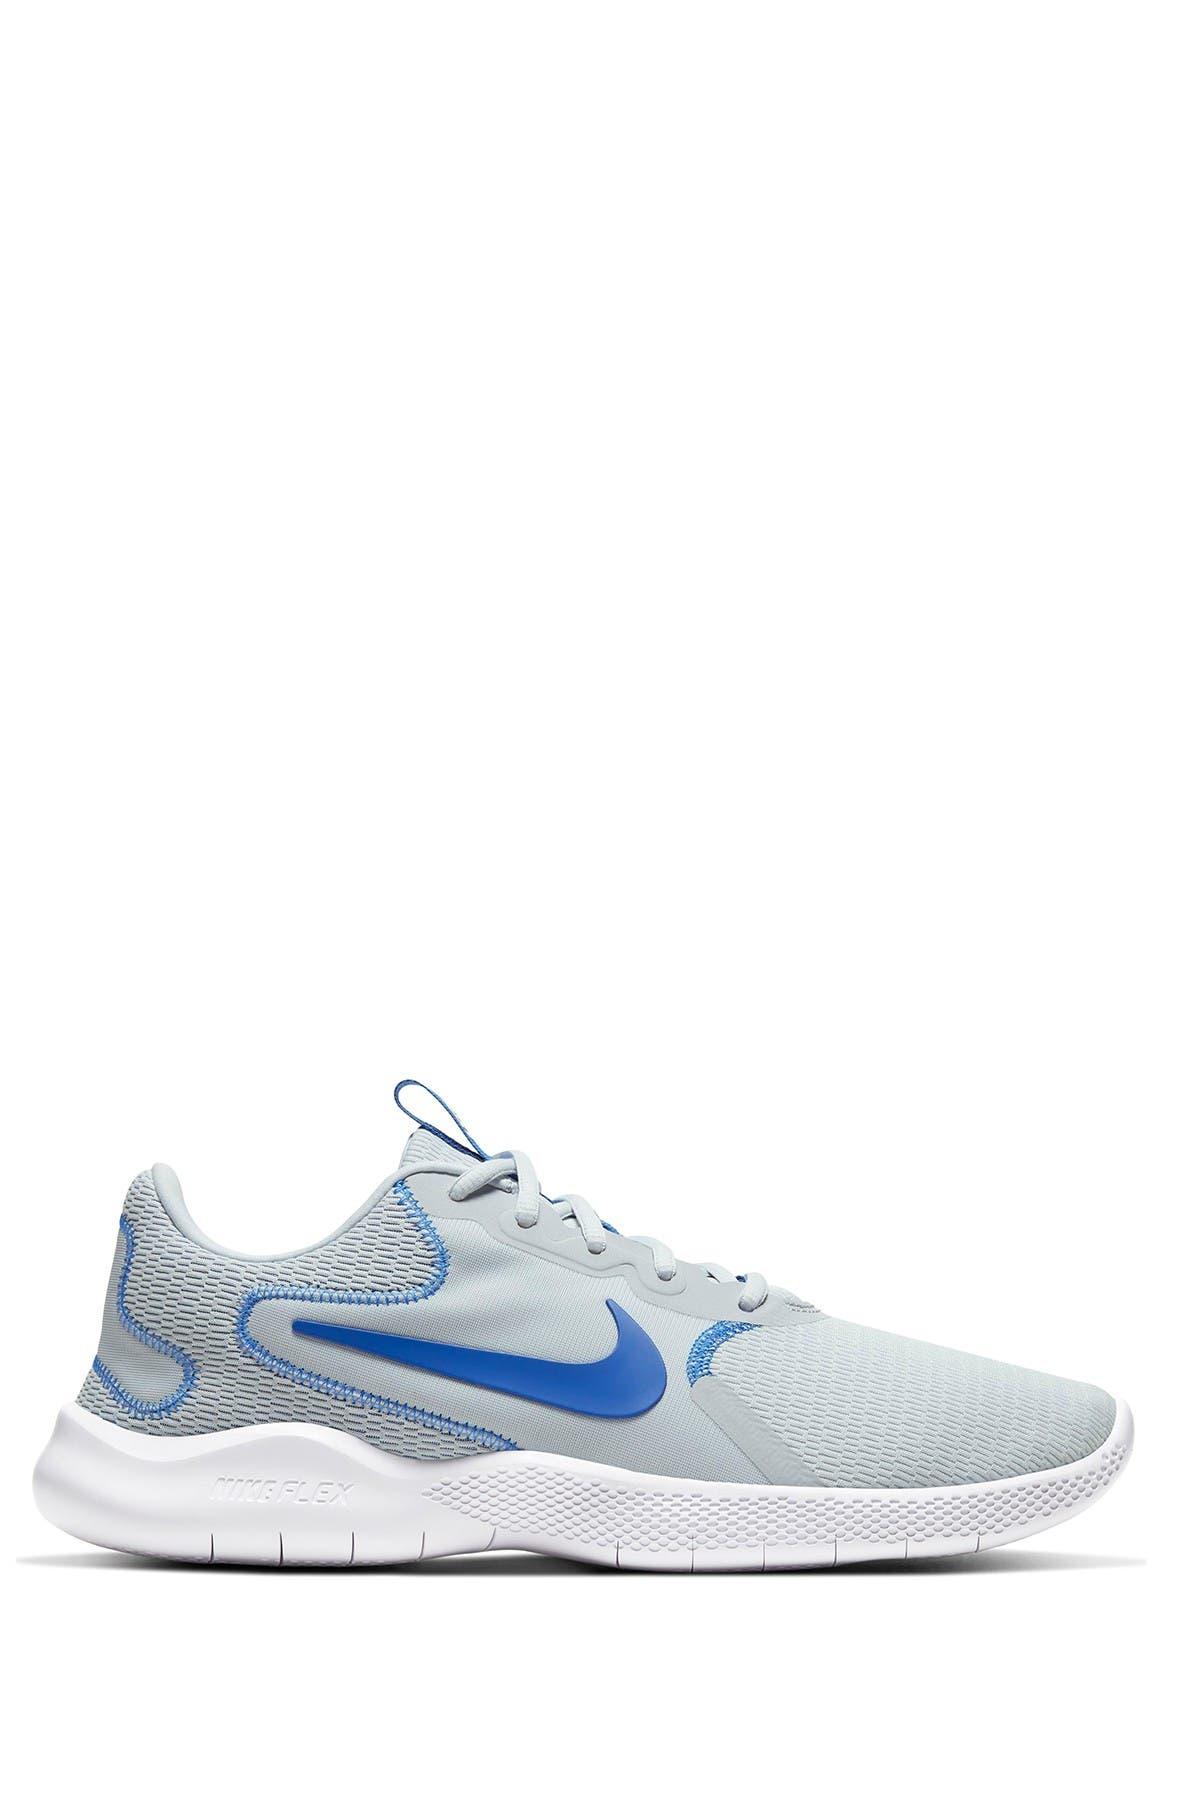 Nike | Flex Experience Running Shoe